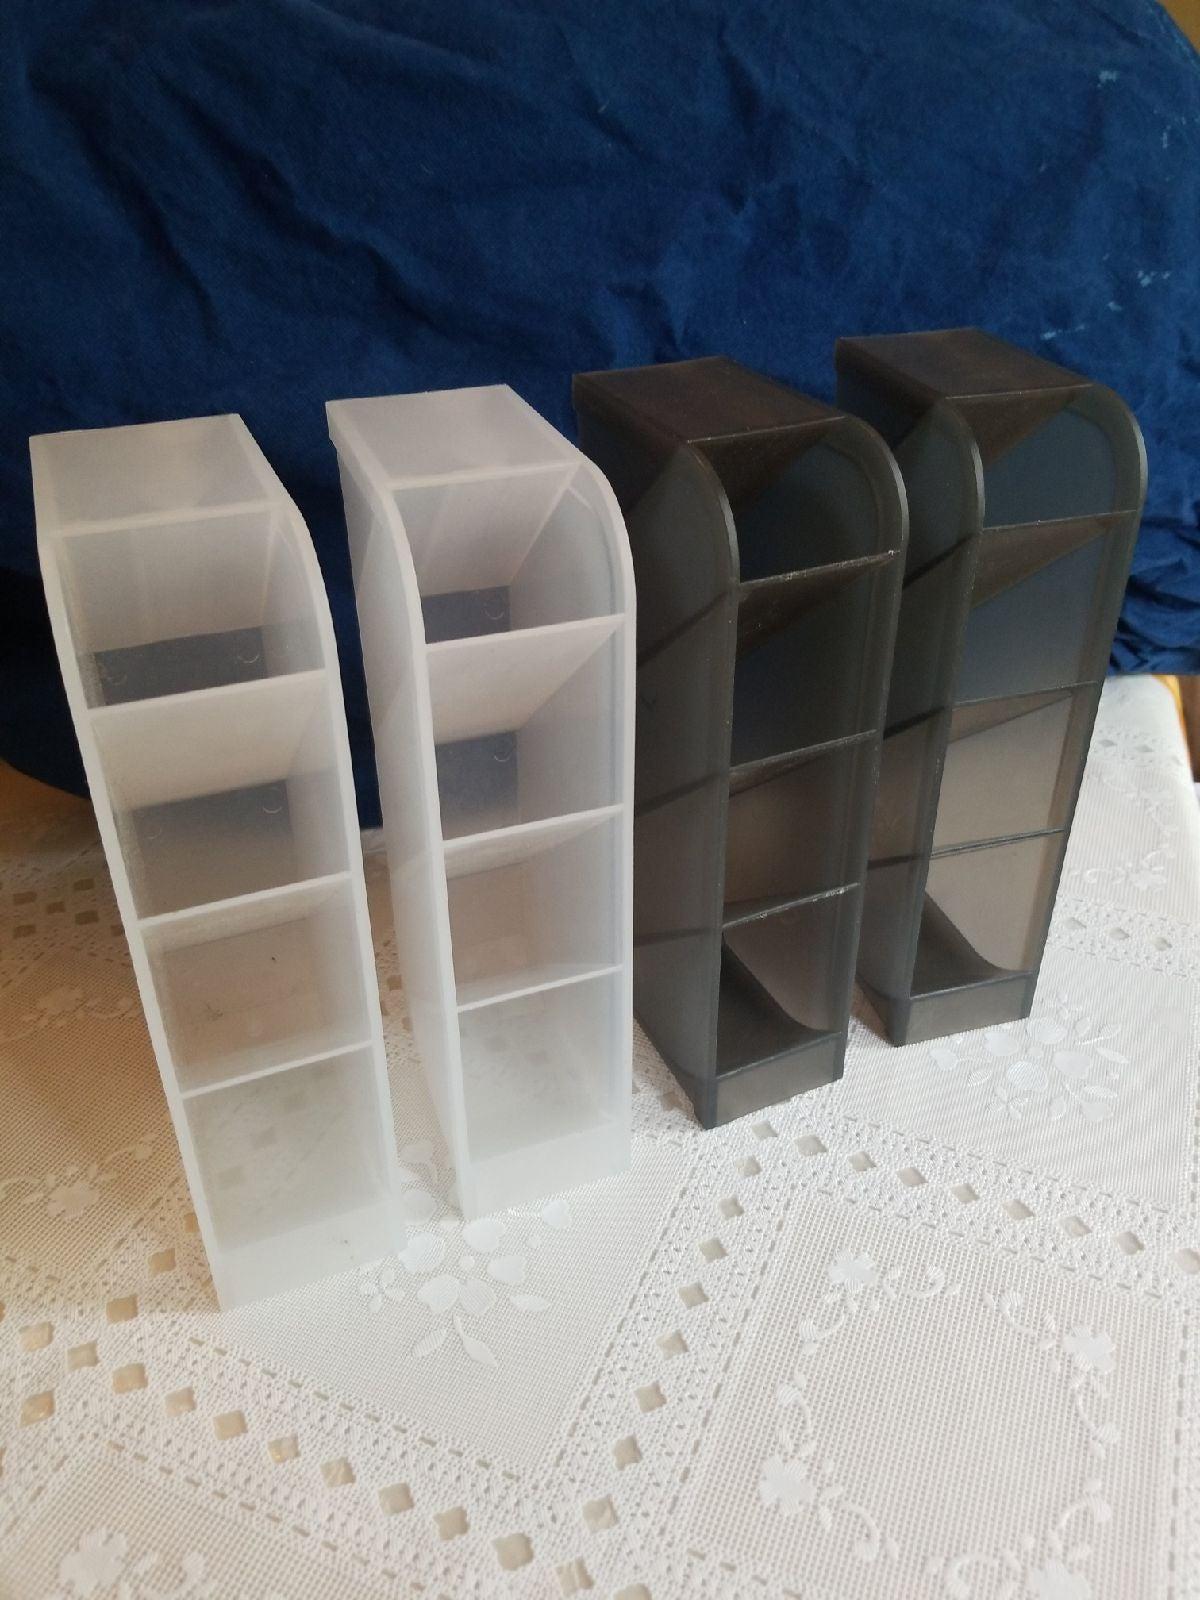 4 plastic desk organizers